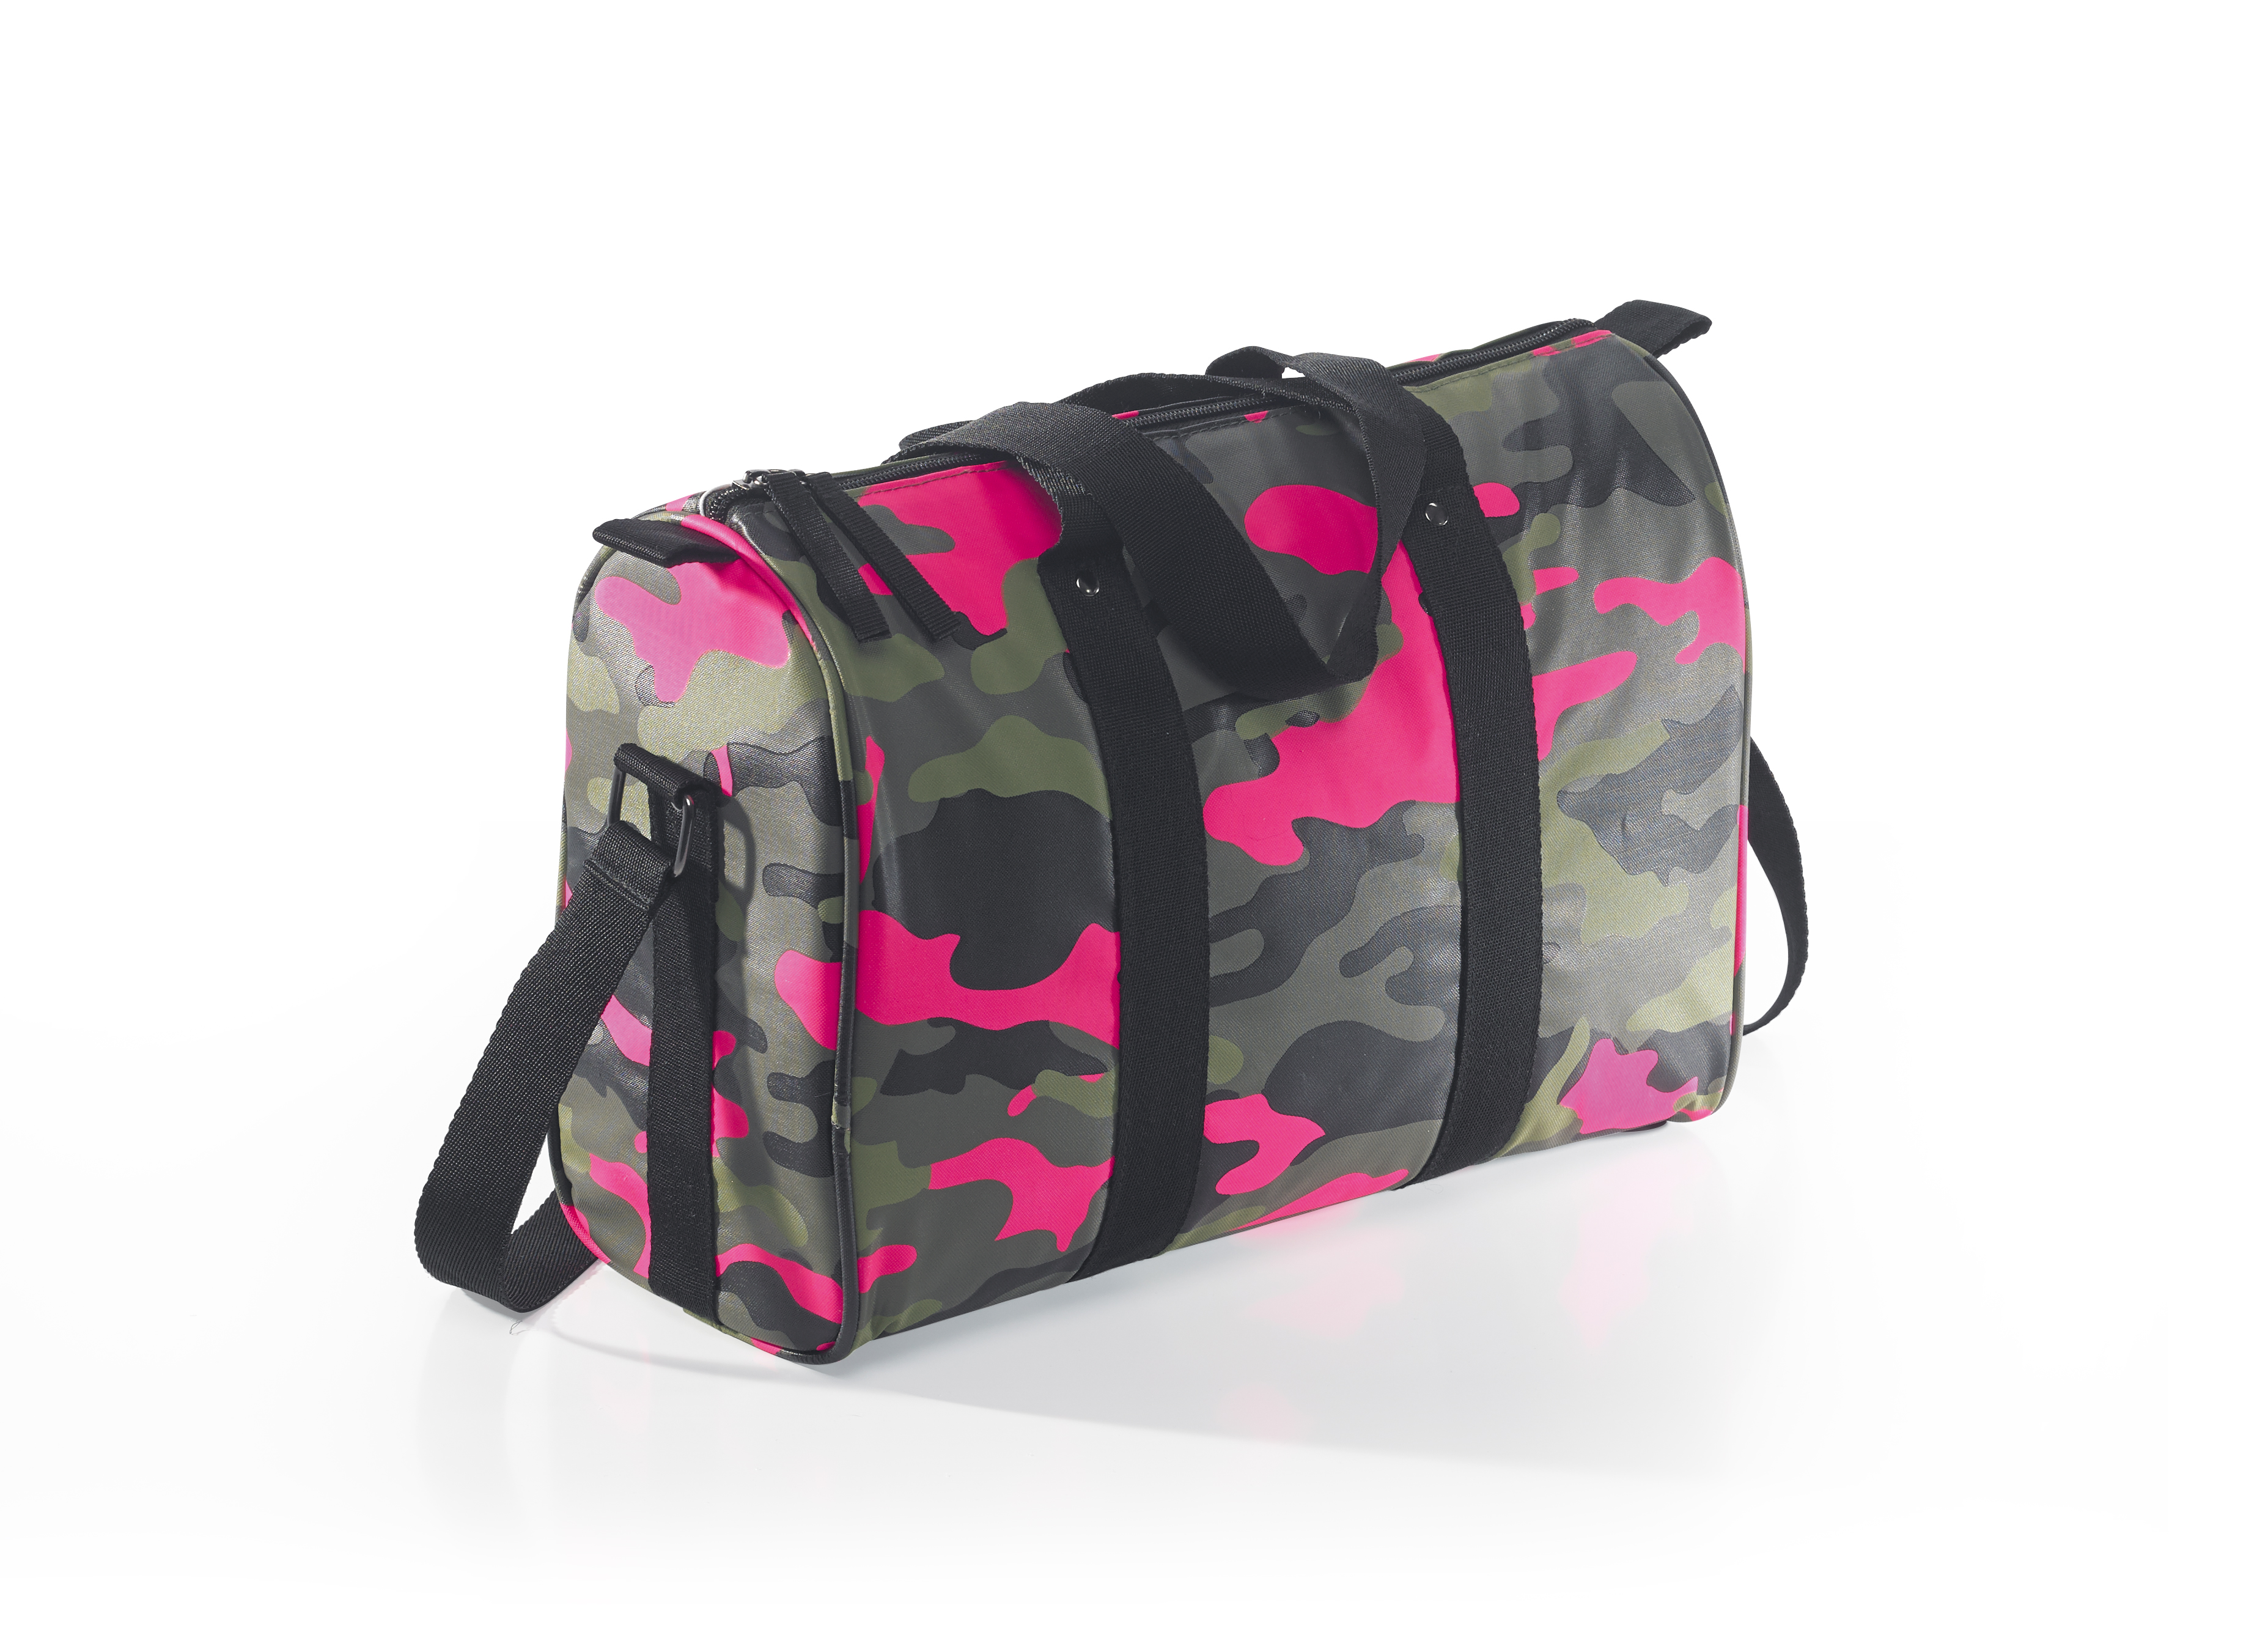 Mini Kühlschrank Pink : L mobicool icon ii kühltasche camouflage pink passiv